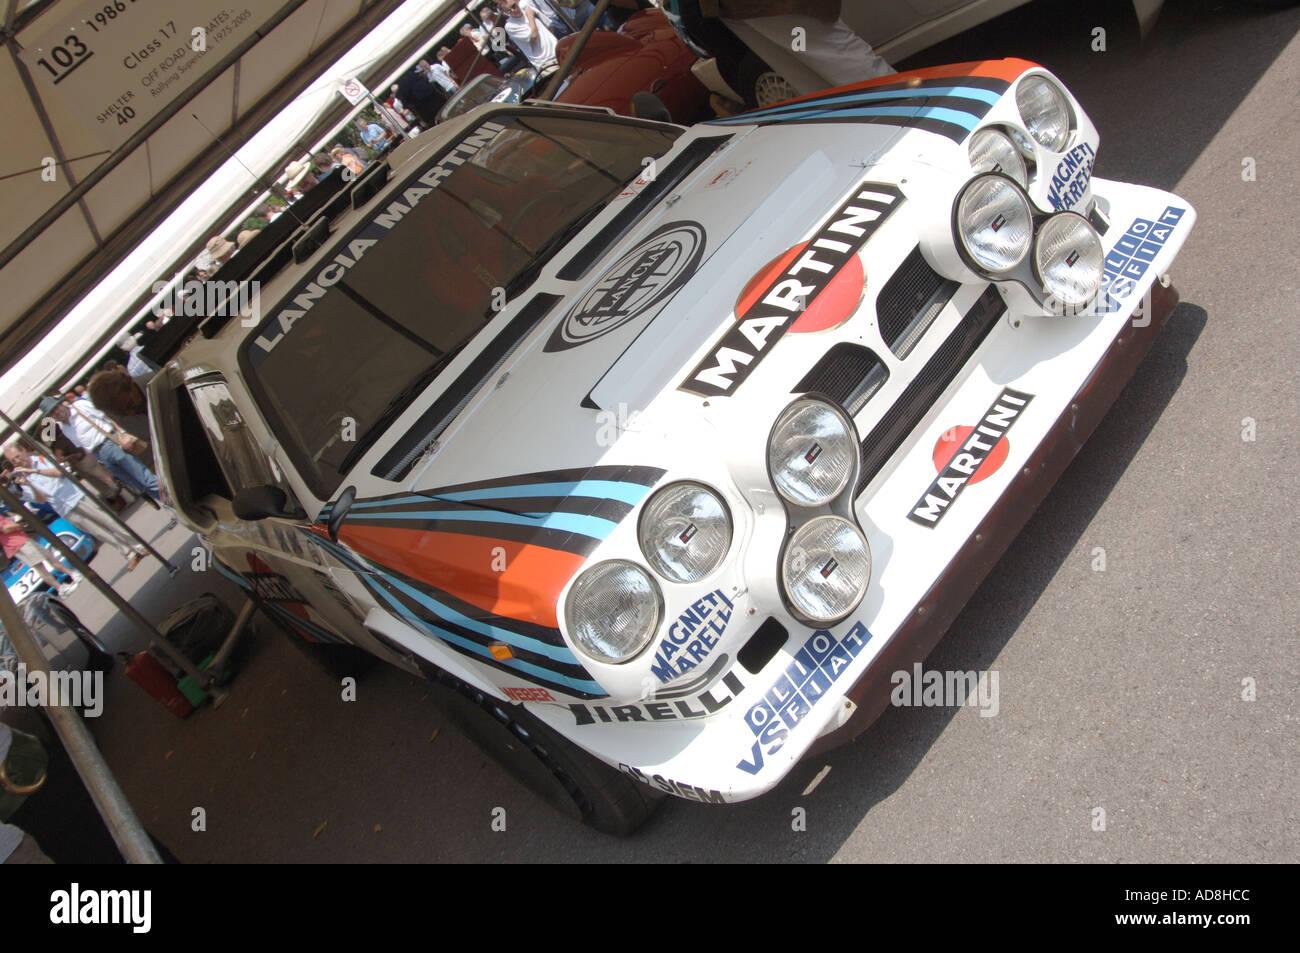 1986 Lancia Delta HF integrale at Goodwood Festival of Speed 2005 - Stock Image